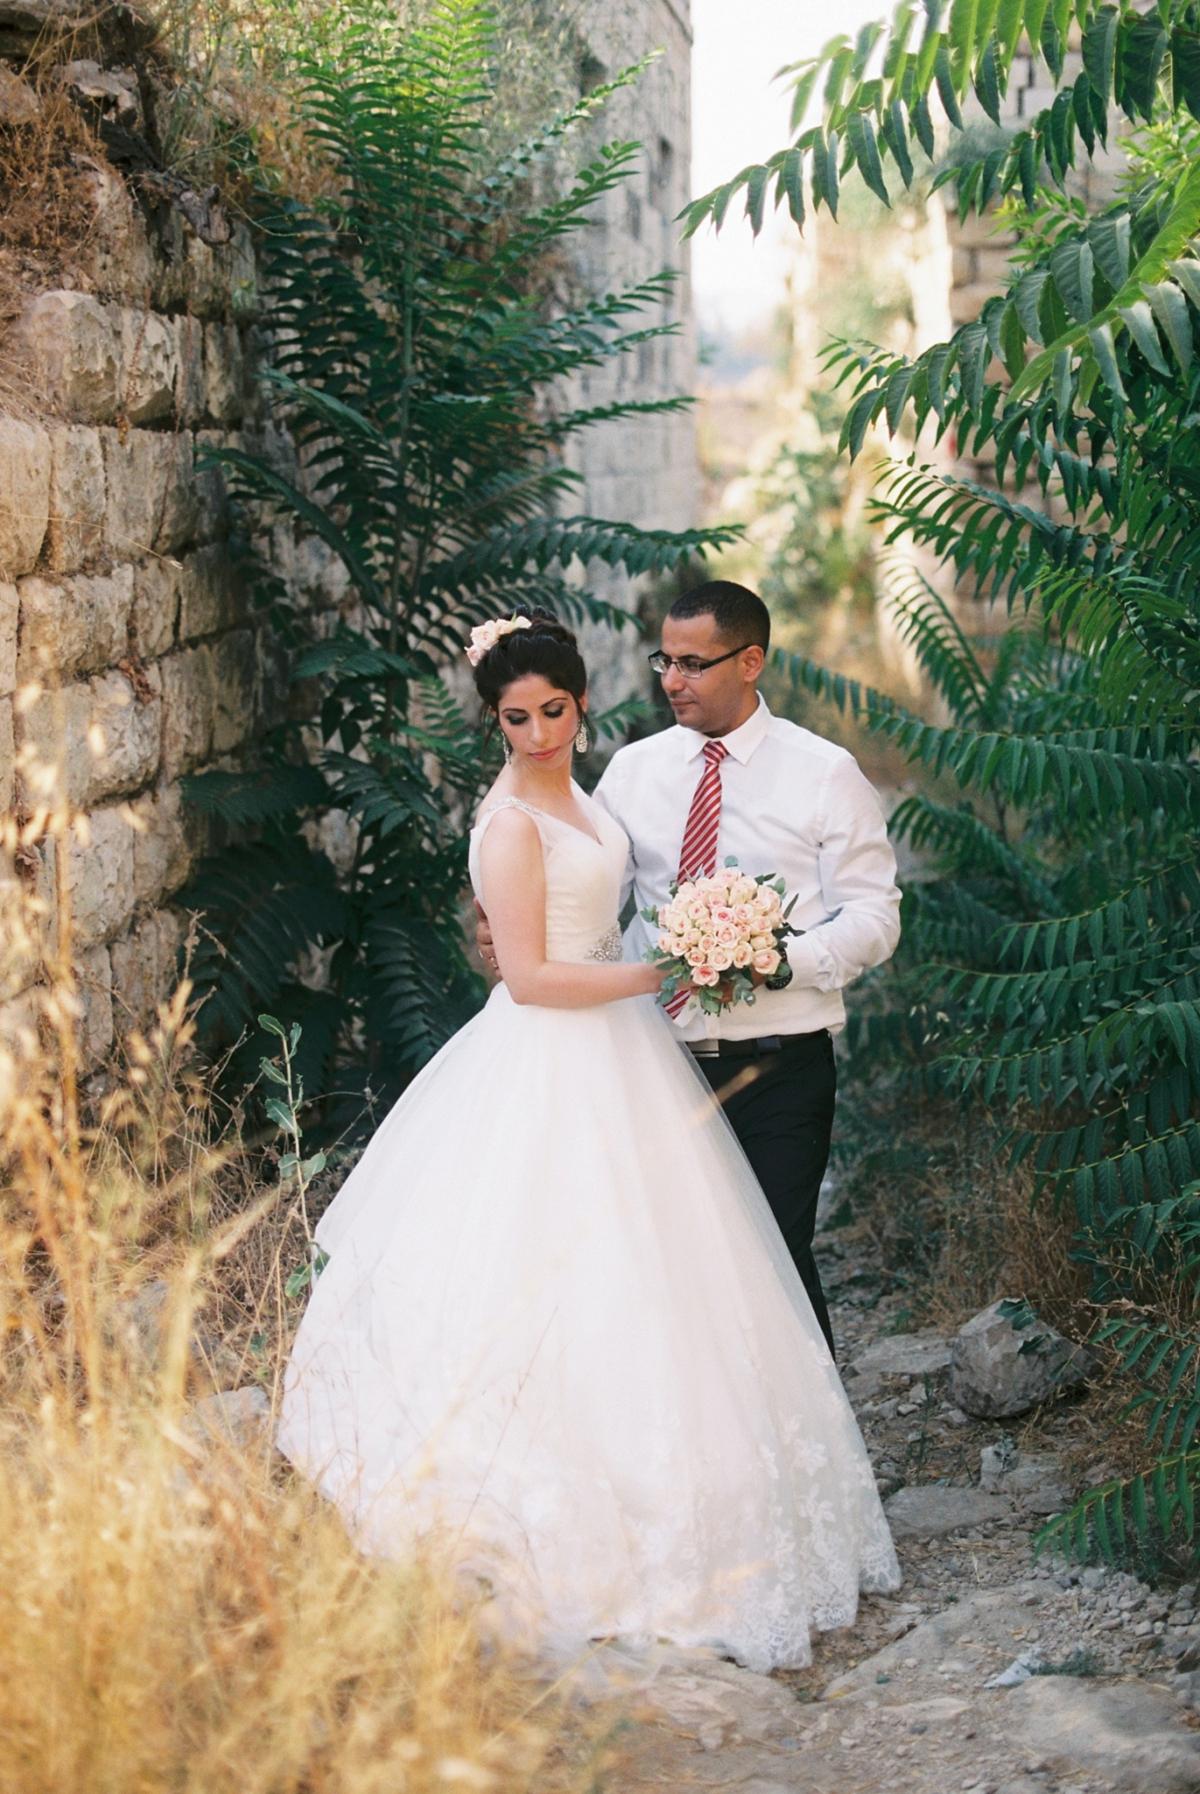 Lifta Bridal Portraits - Jerusalem Israel - Muna and Ali - Sigala Photography_0001